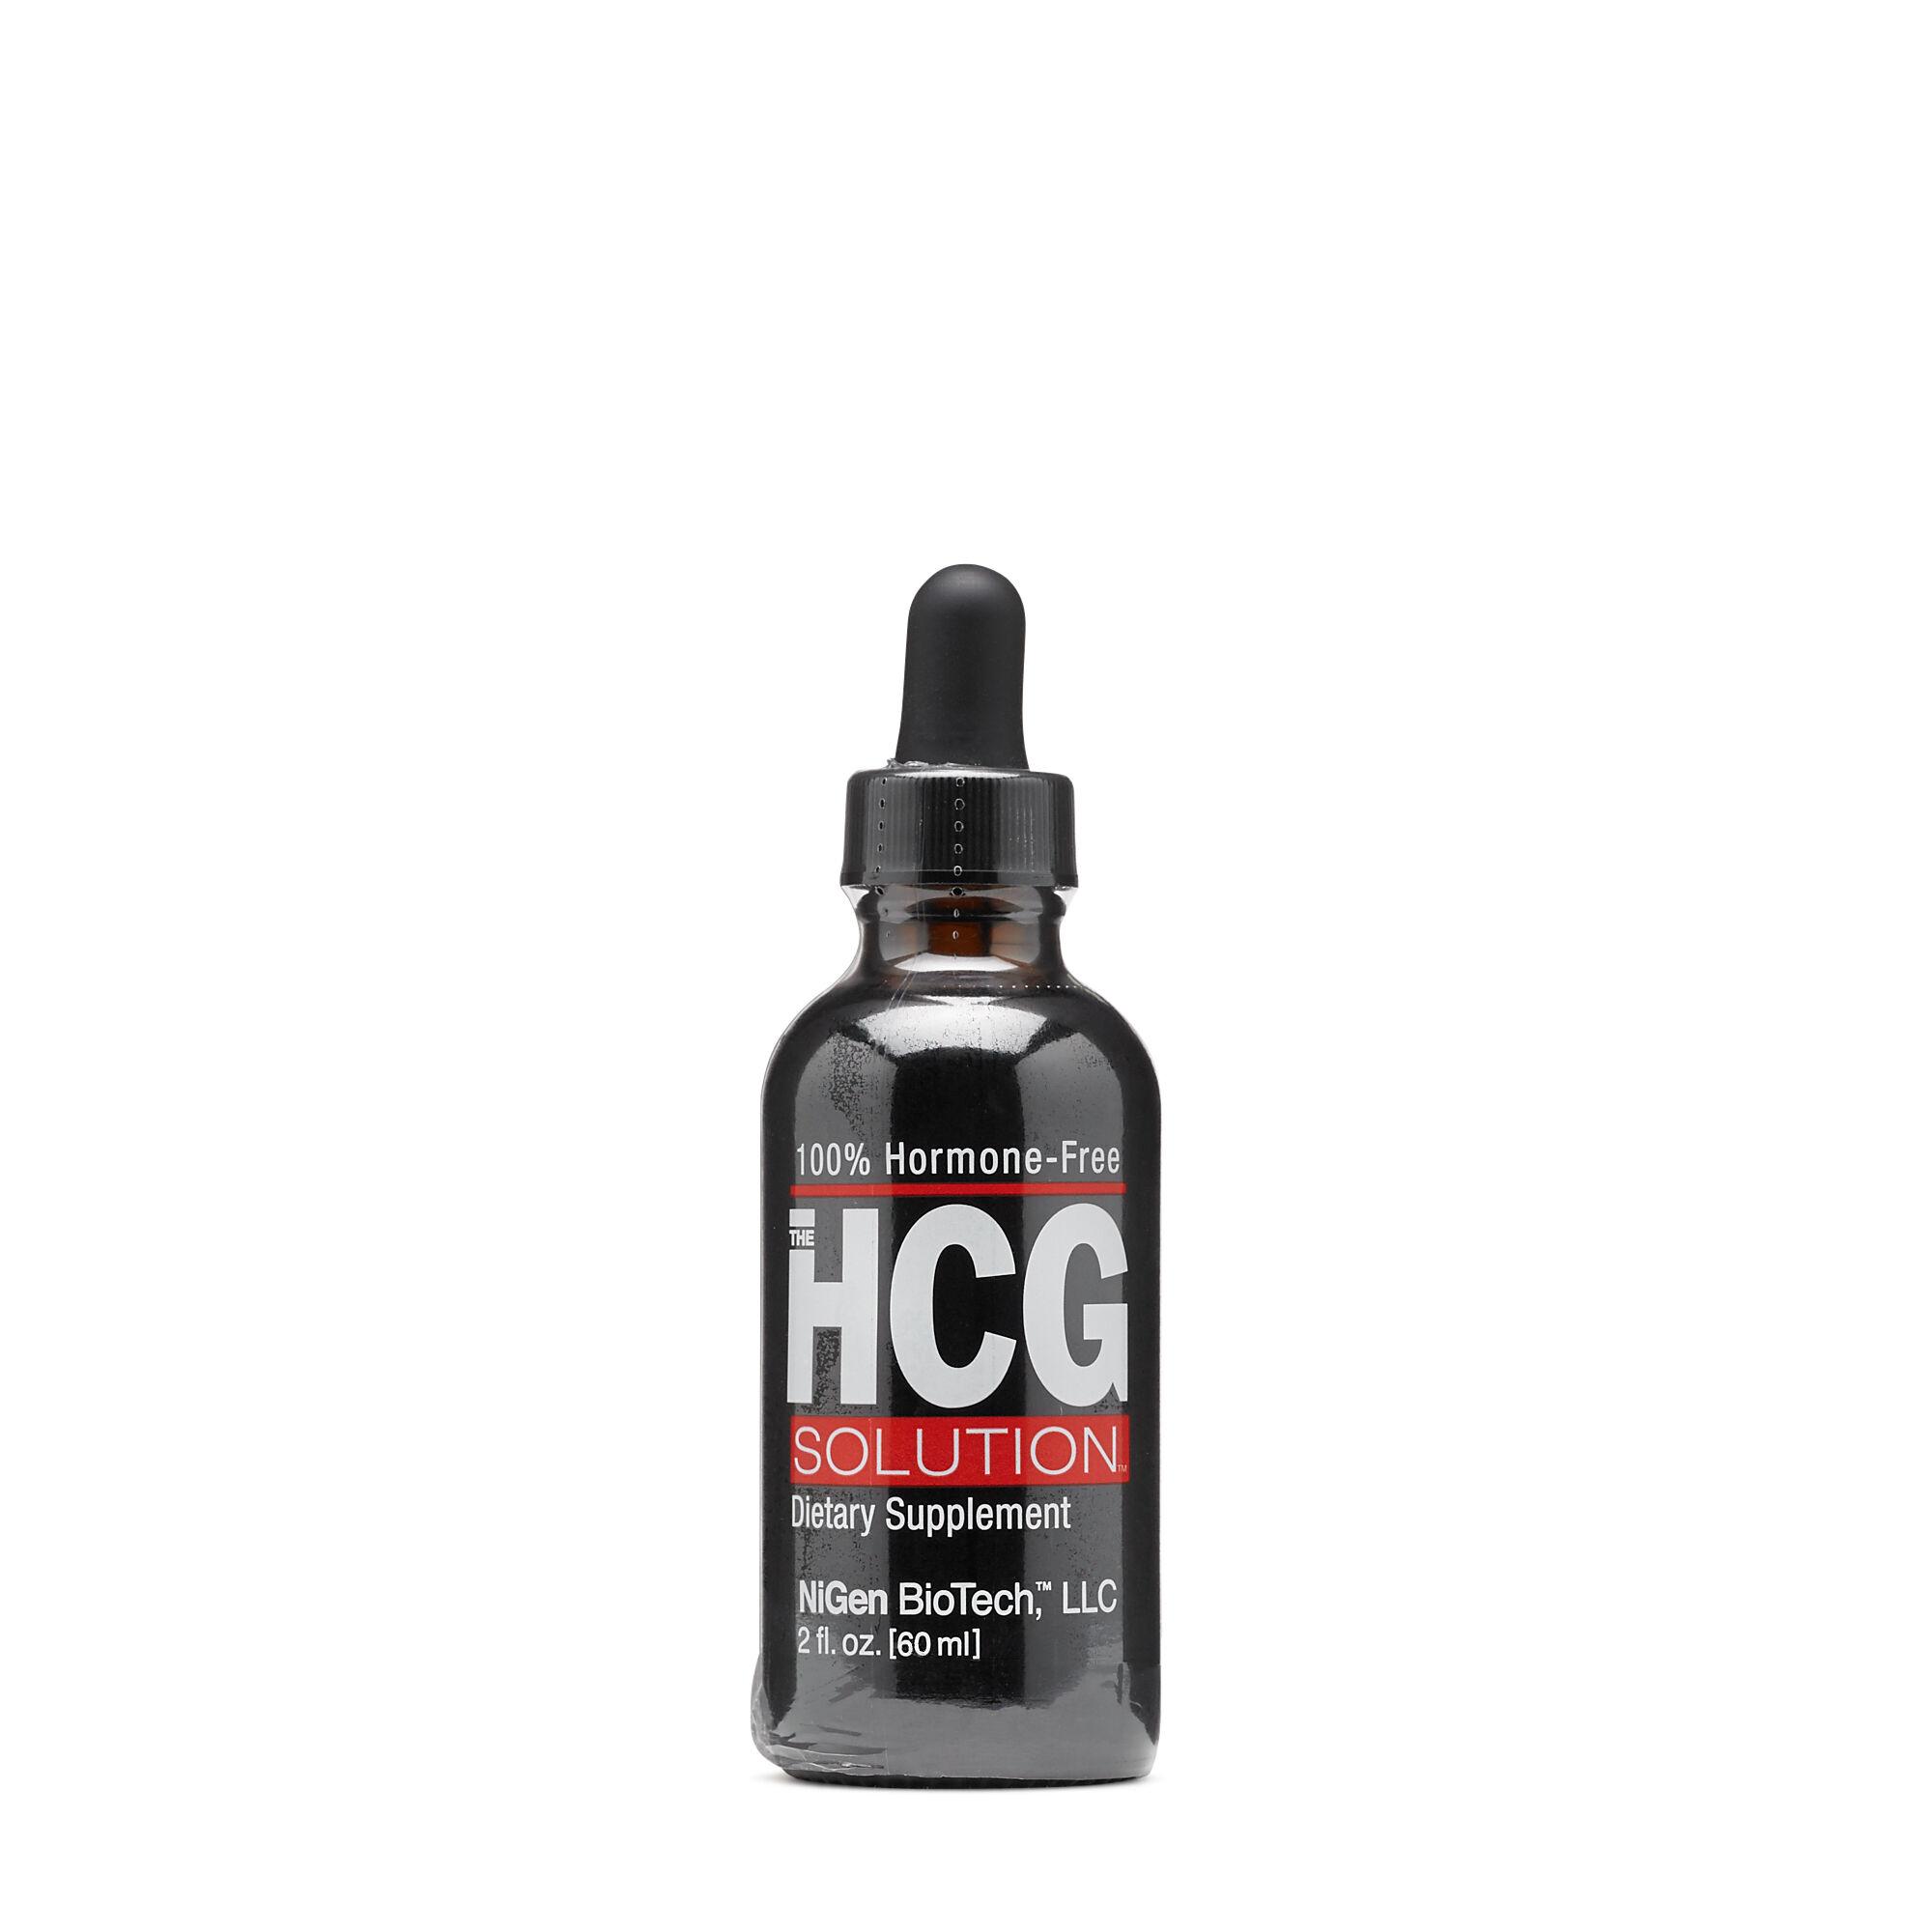 NiGen BioTech The HCG Solution™